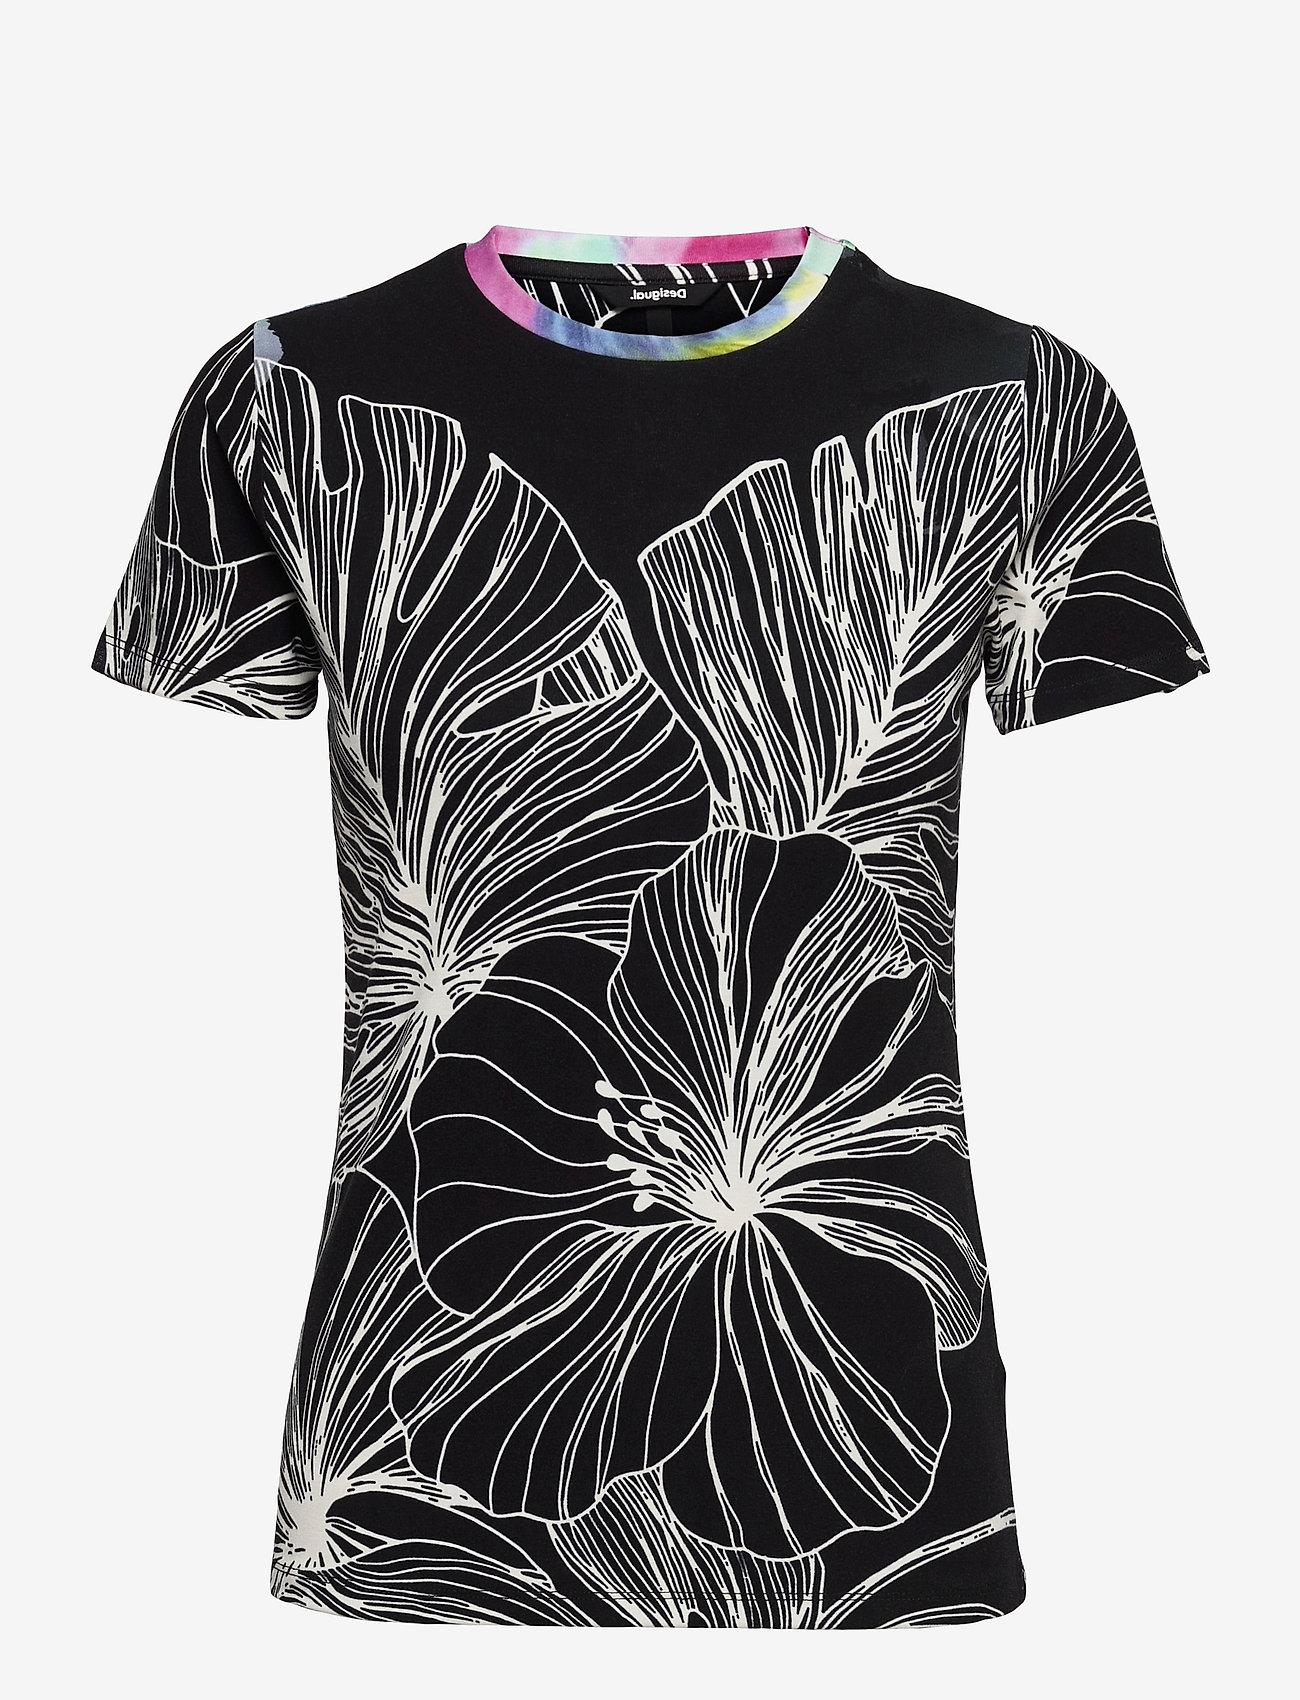 Desigual - TS LEAVES - t-shirts - negro - 0